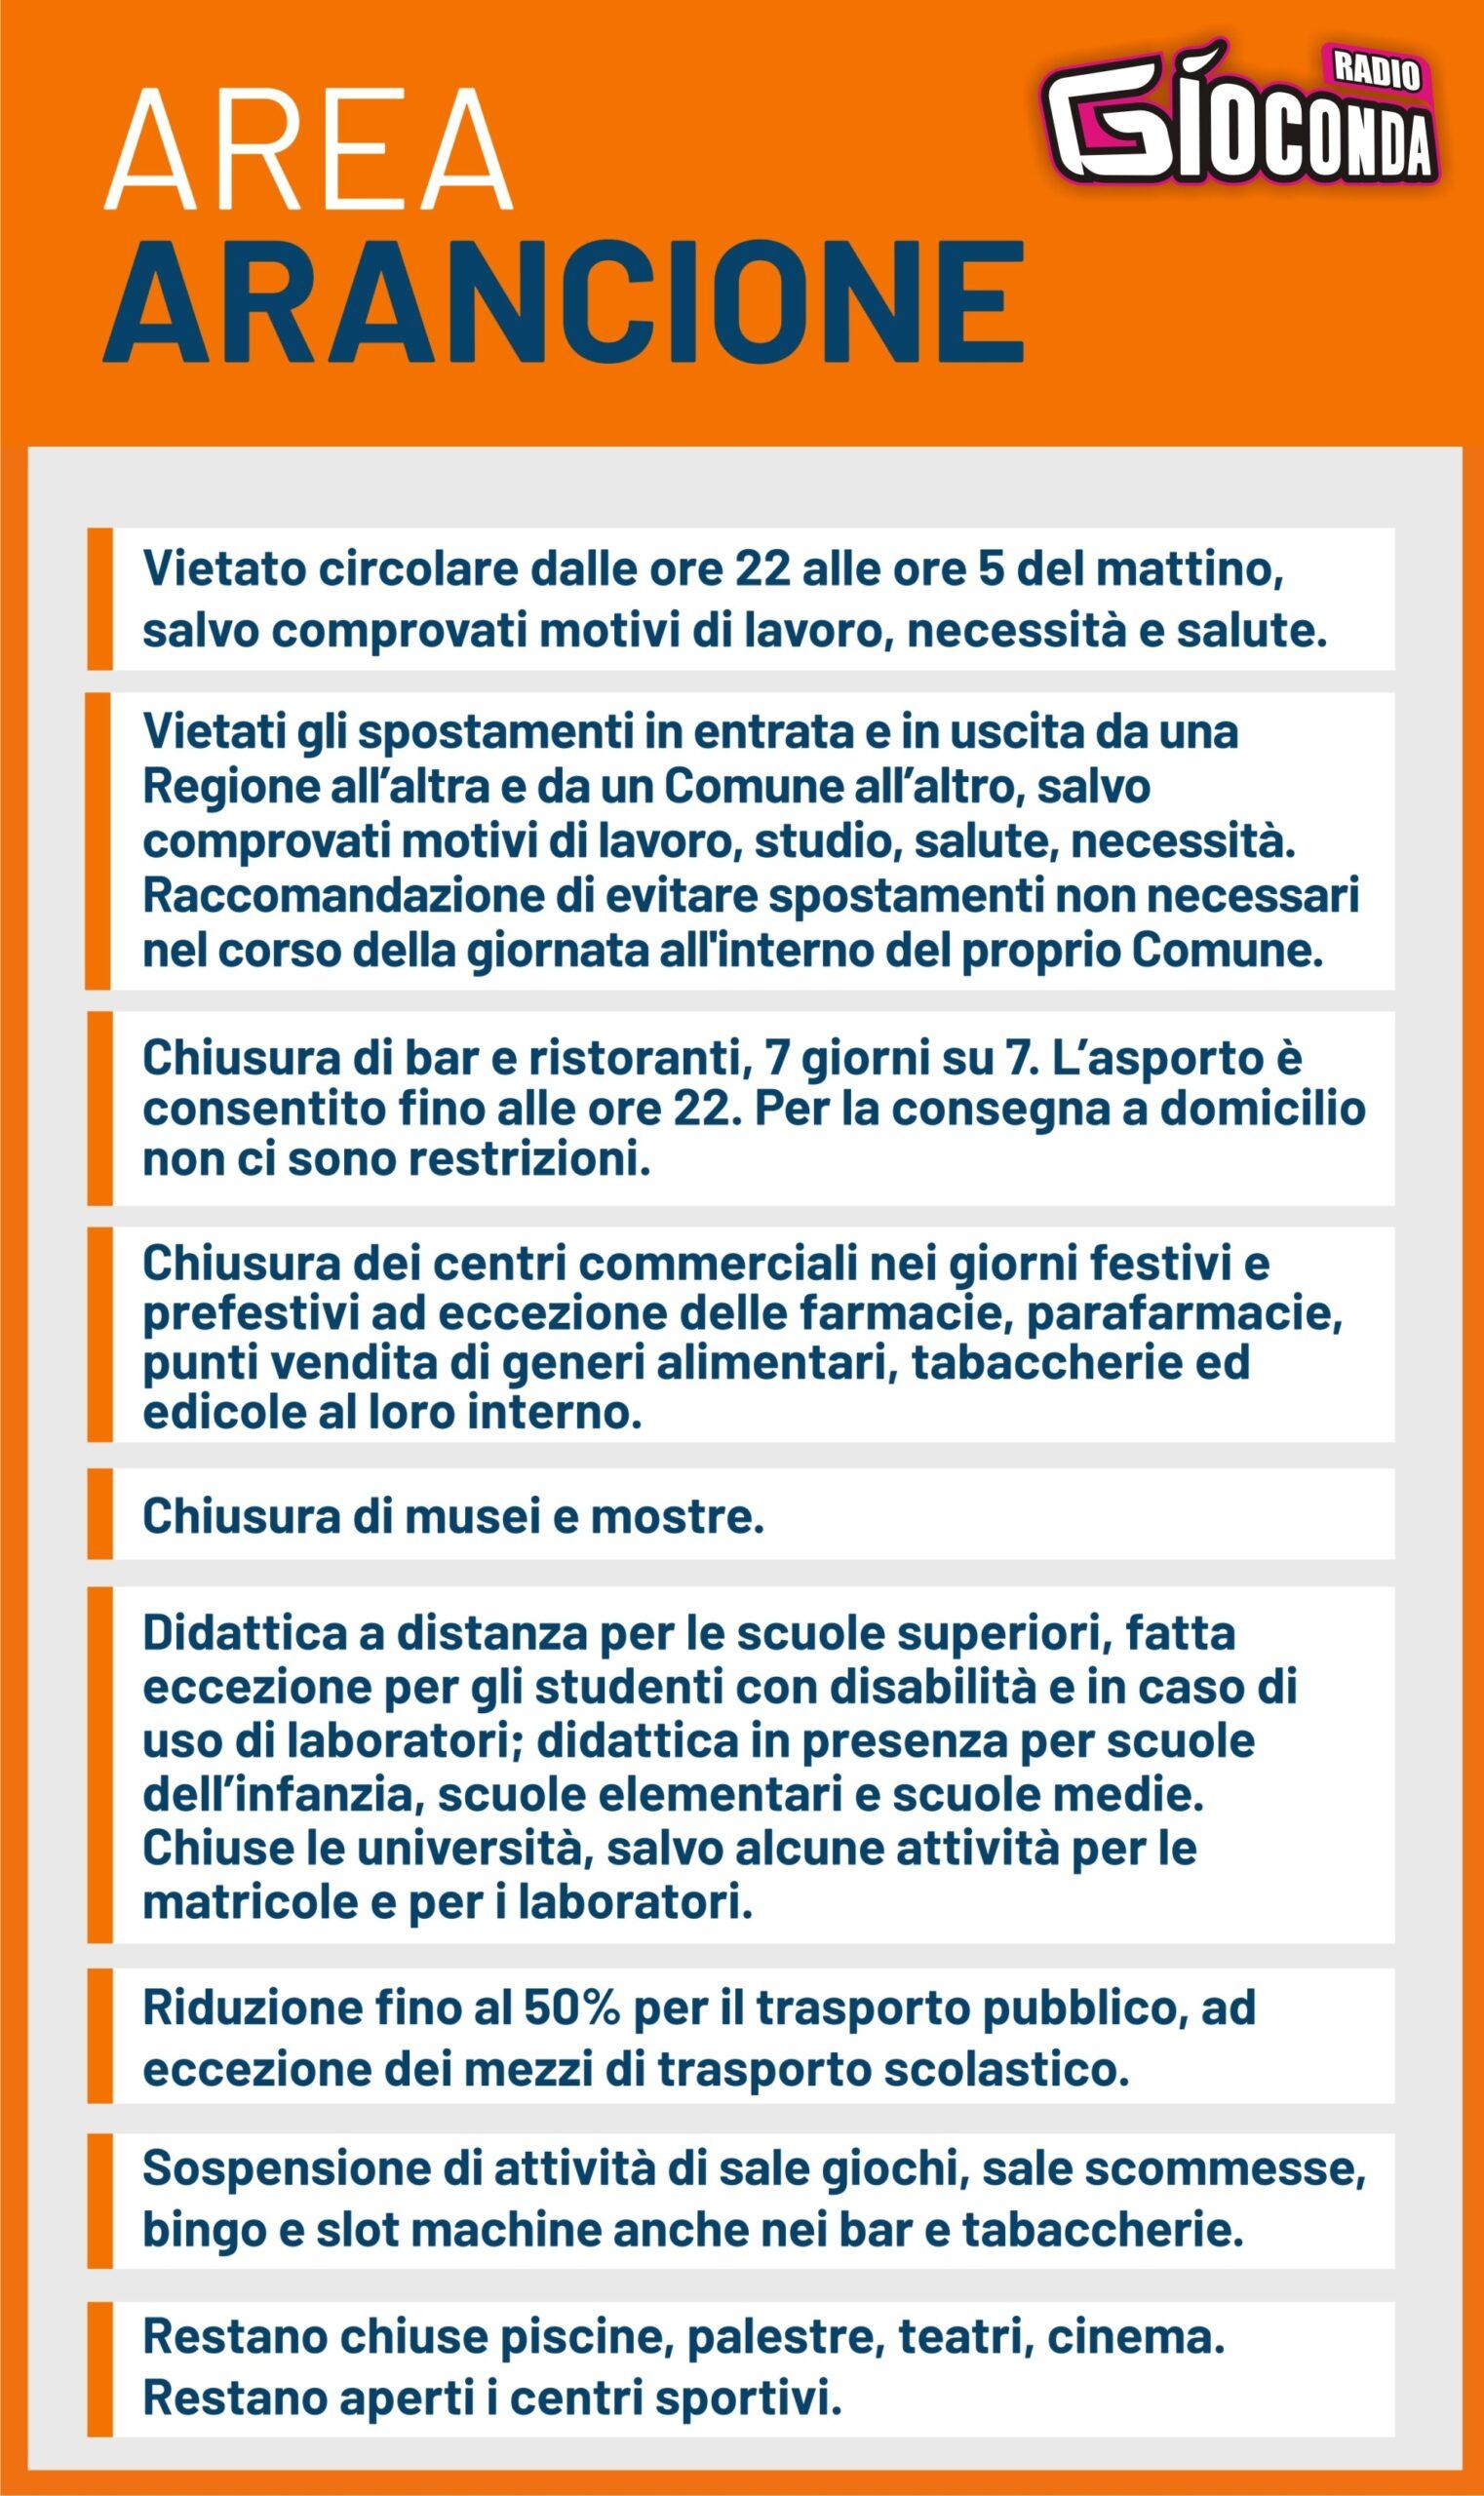 Friuli Venezia Giulia è AREA ARANCIONE